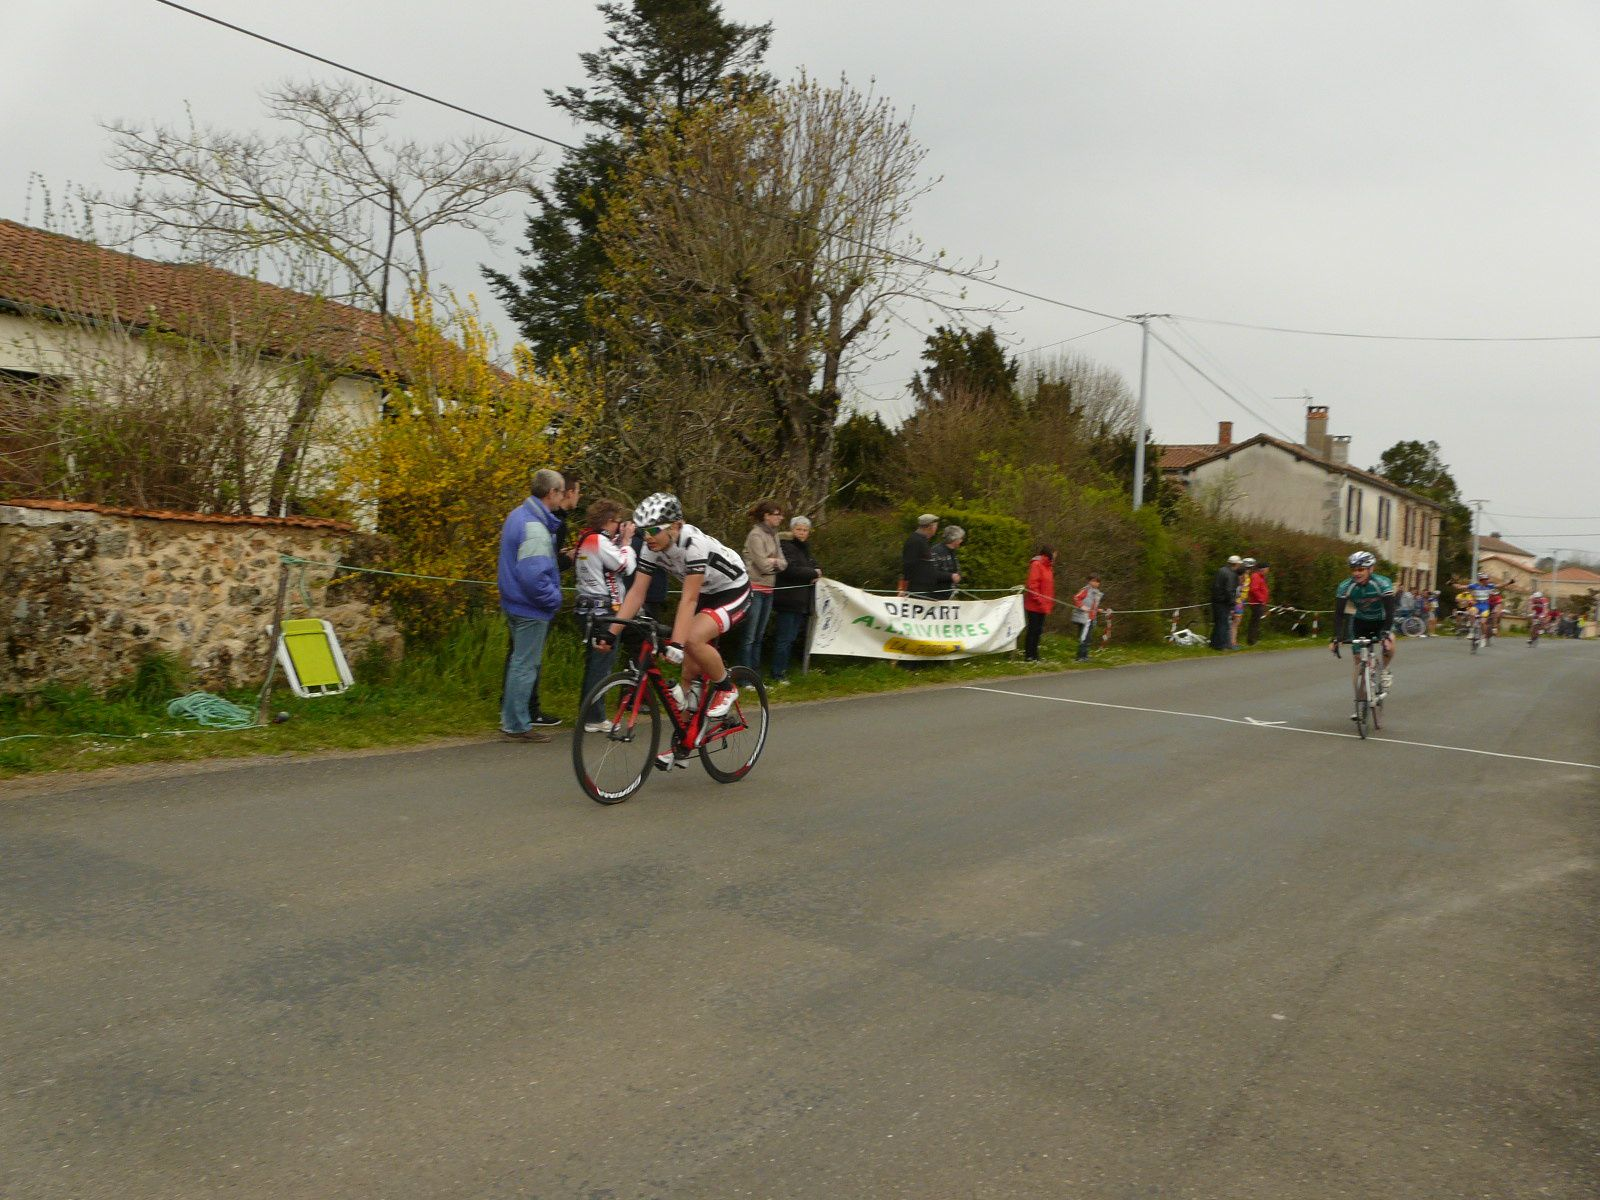 217 coureurs à l'interclub de St Adjutory